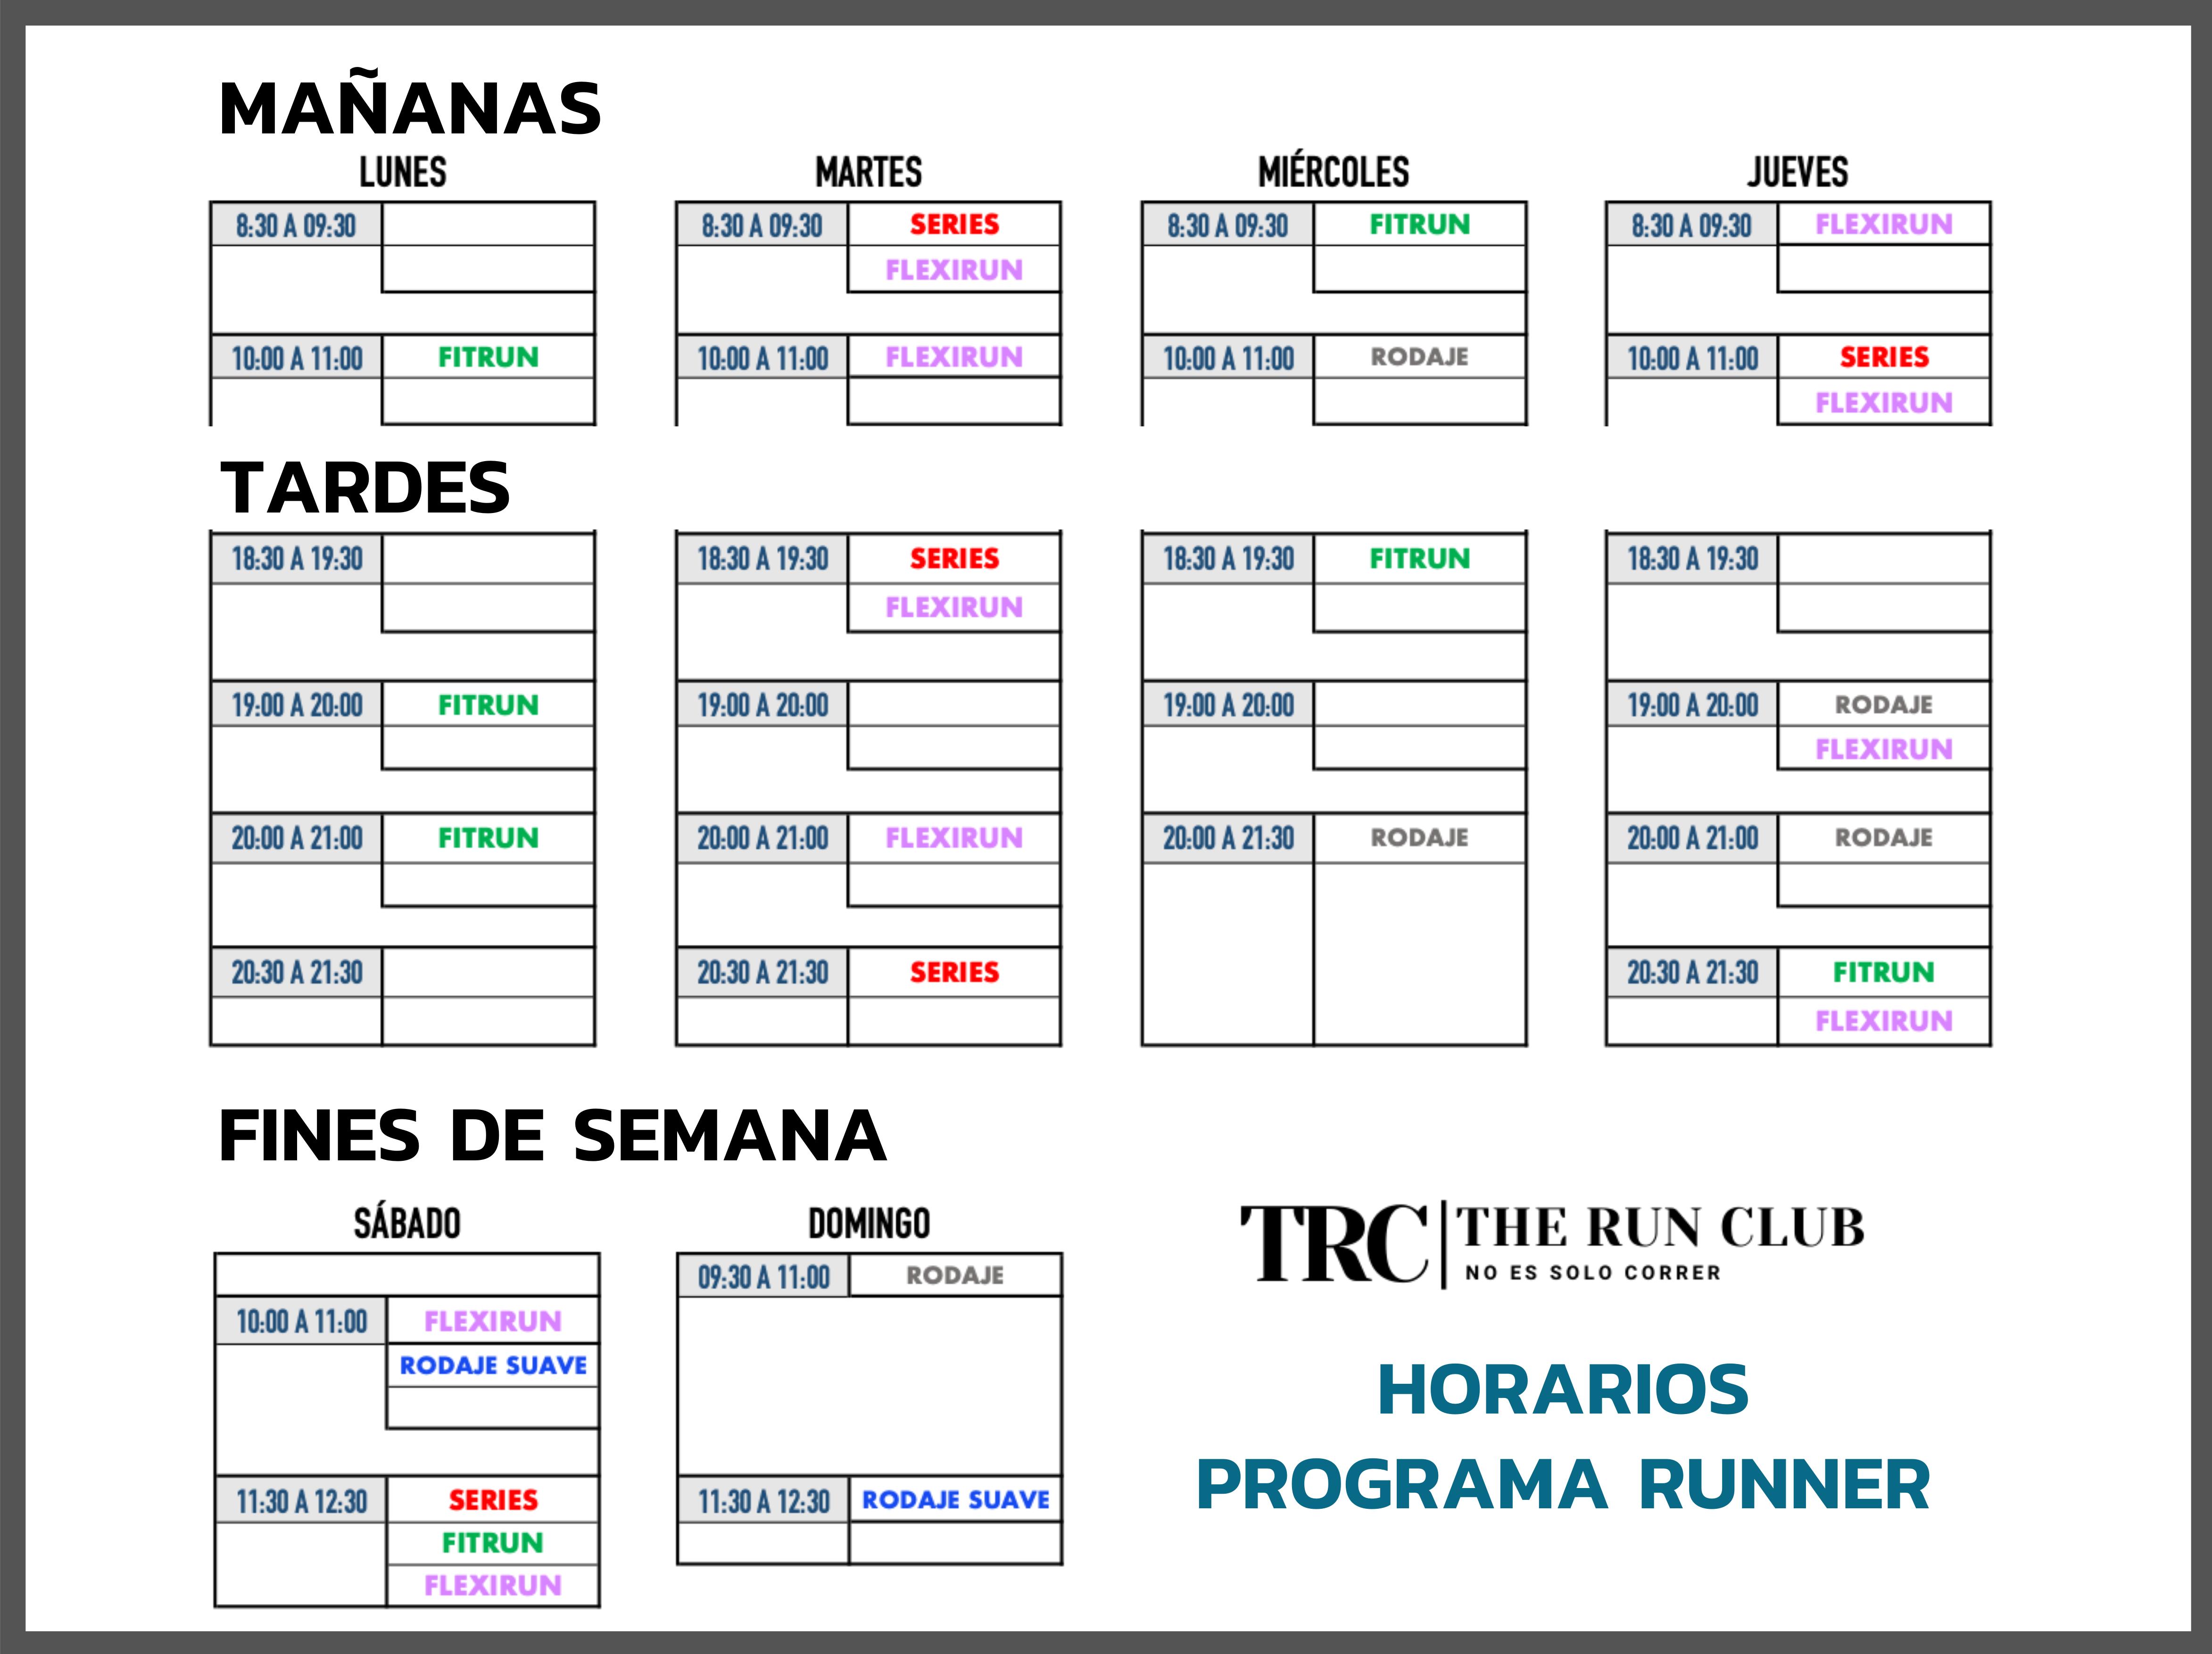 HORARIO PROGRAMA RUNNER TEMPORADA 20-21 - TRC - THE RUN CLUB - CLUB DE CORREDORES MADRID